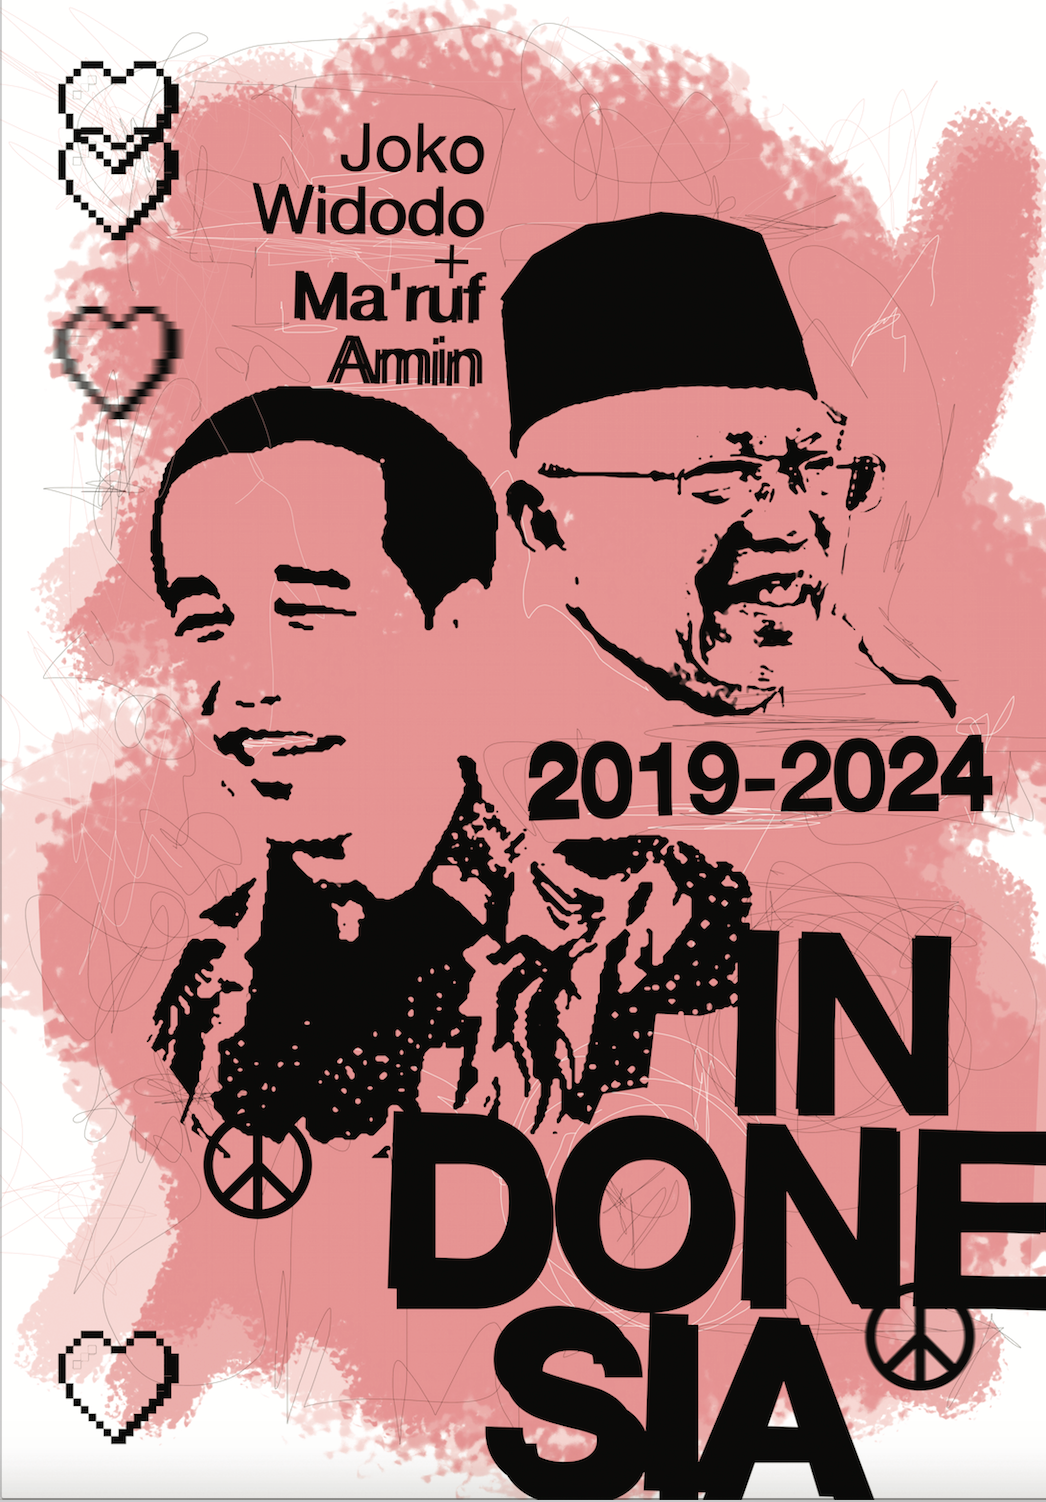 Pameran Poster indonesia Francesco Mazzenga